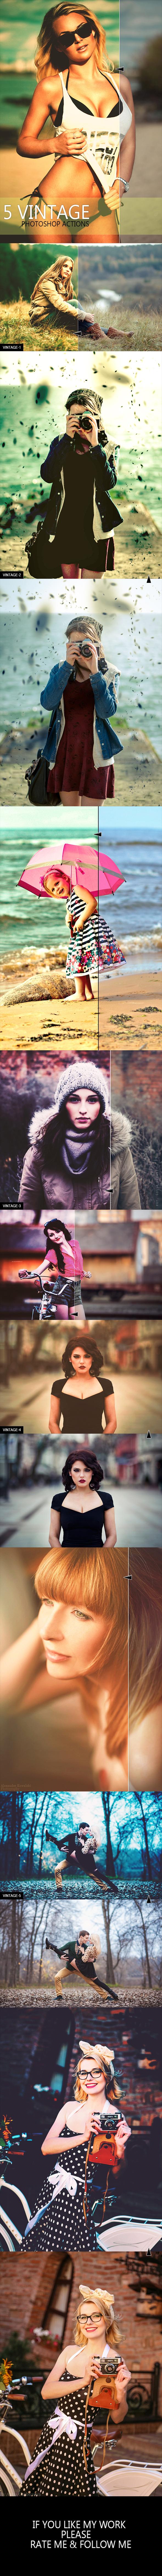 5 Vintage Photoshop Action - 11562781